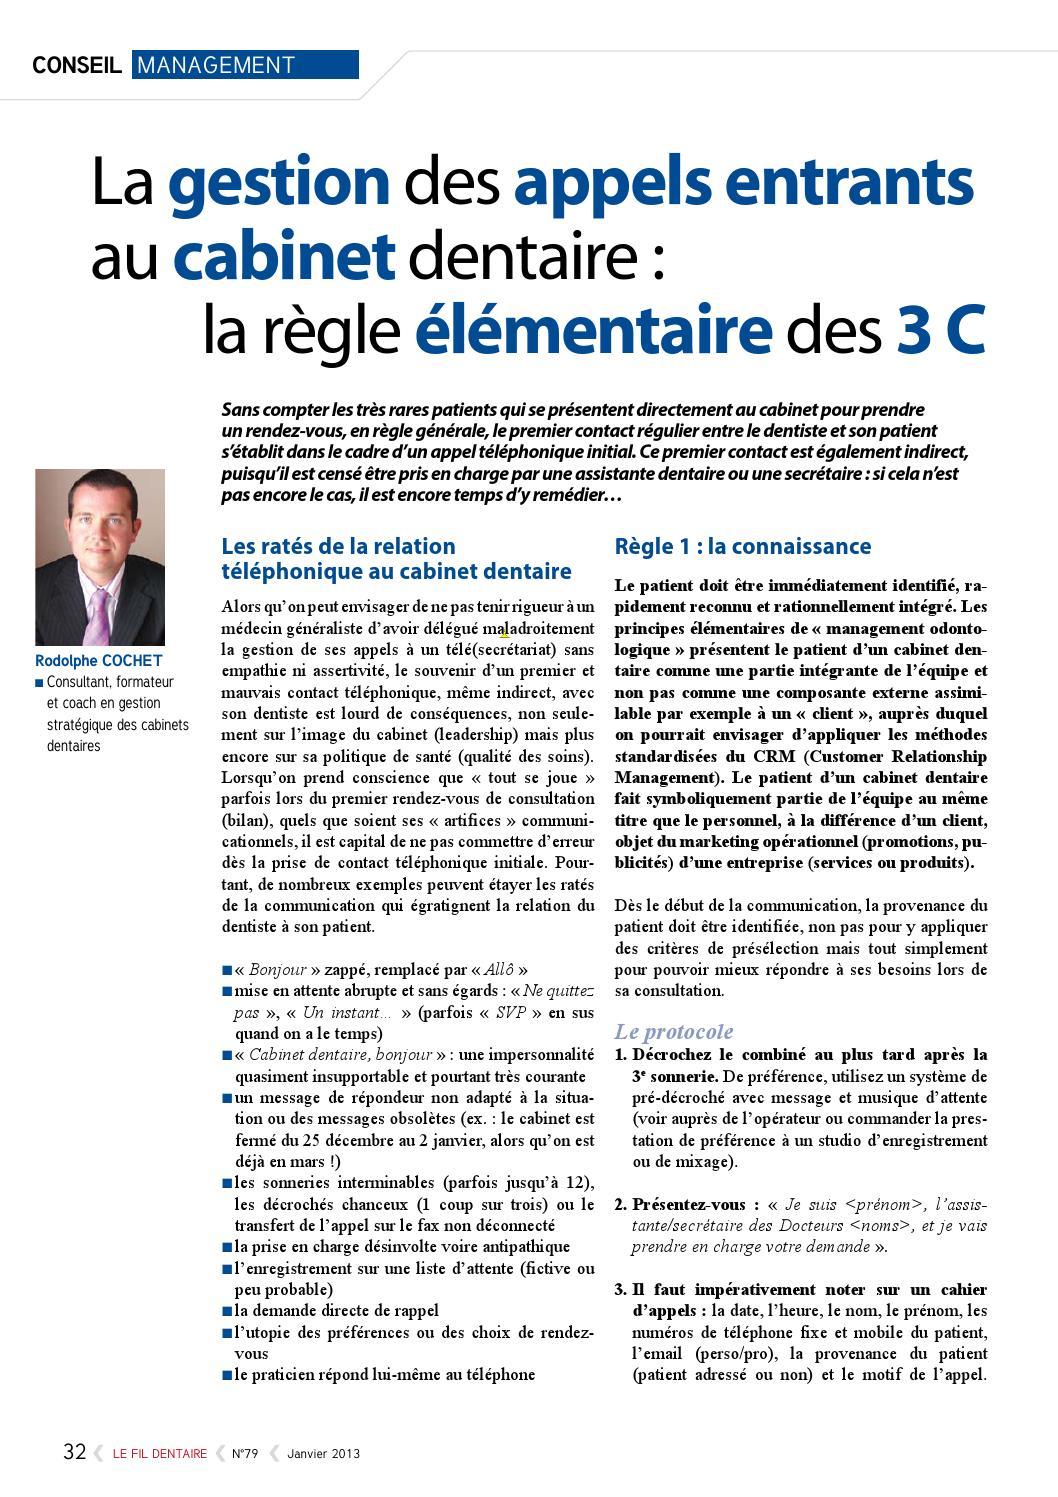 Mieux g rer son agenda au cabinet dentaire la r ception t l phonique by rodolphe cochet issuu - Application gestion cabinet dentaire ...